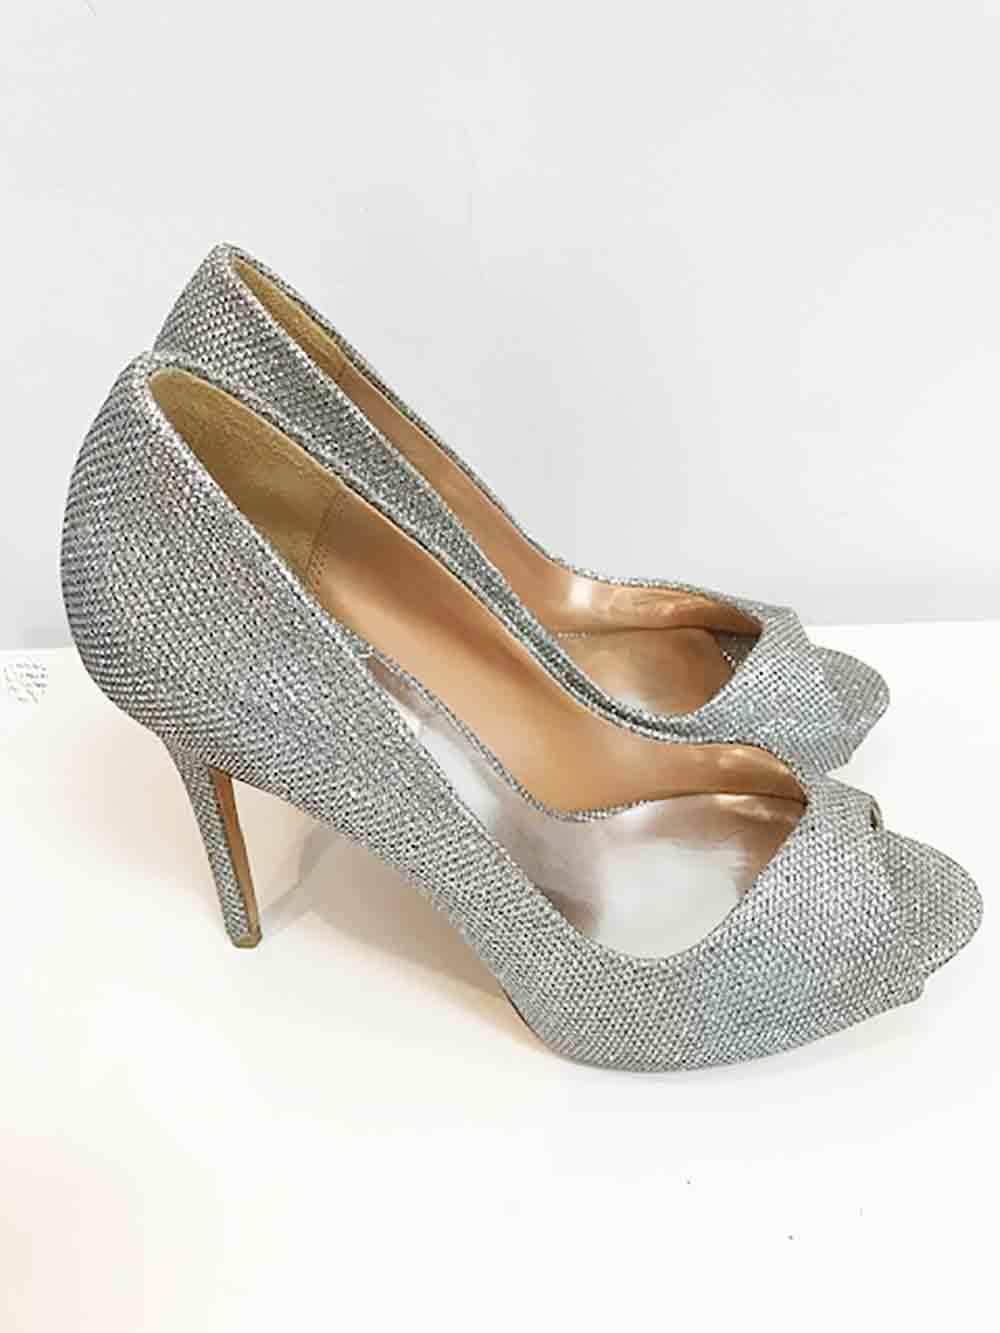 Designer Designer Designer BNWOB Badgley Mischka Size 8M Leather & Silver Fabric Women's Heels e2916b